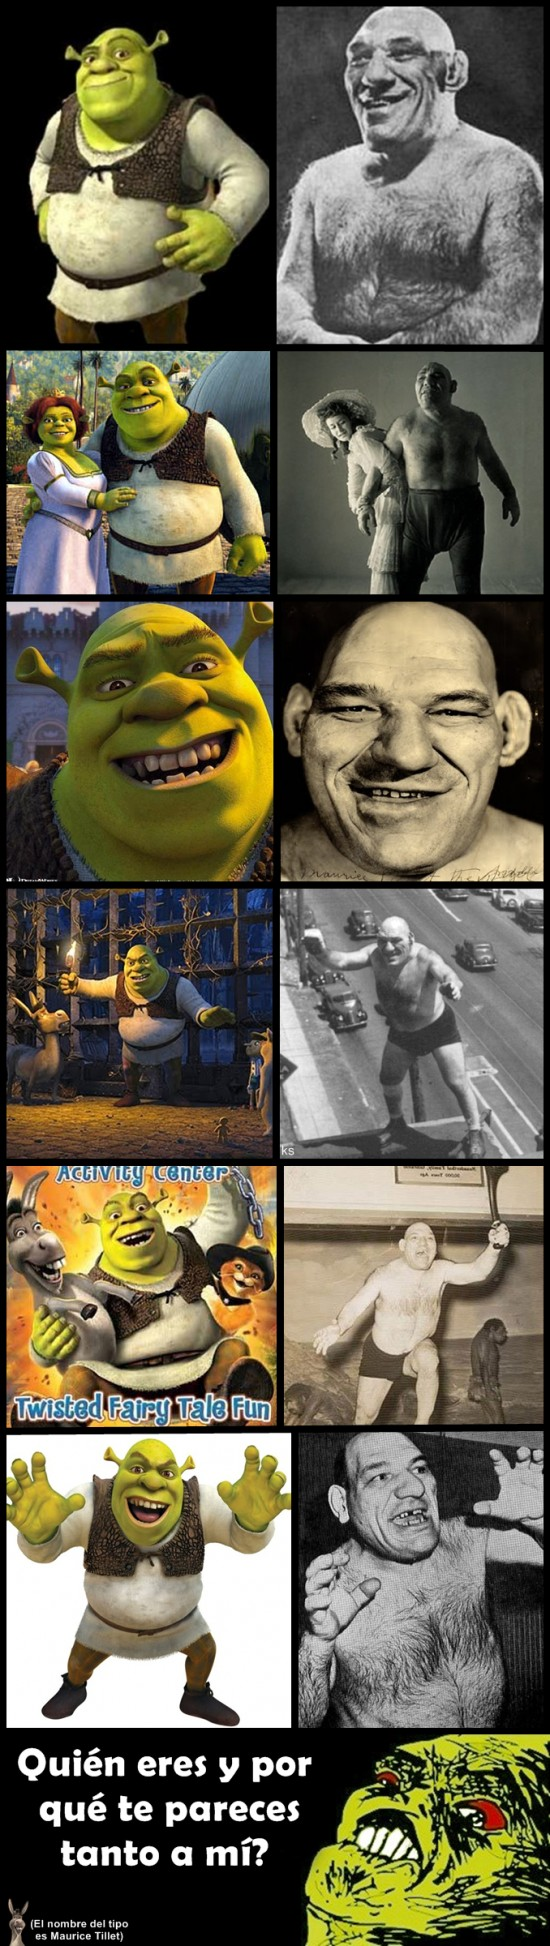 Inglip - Shrek en el mundo real